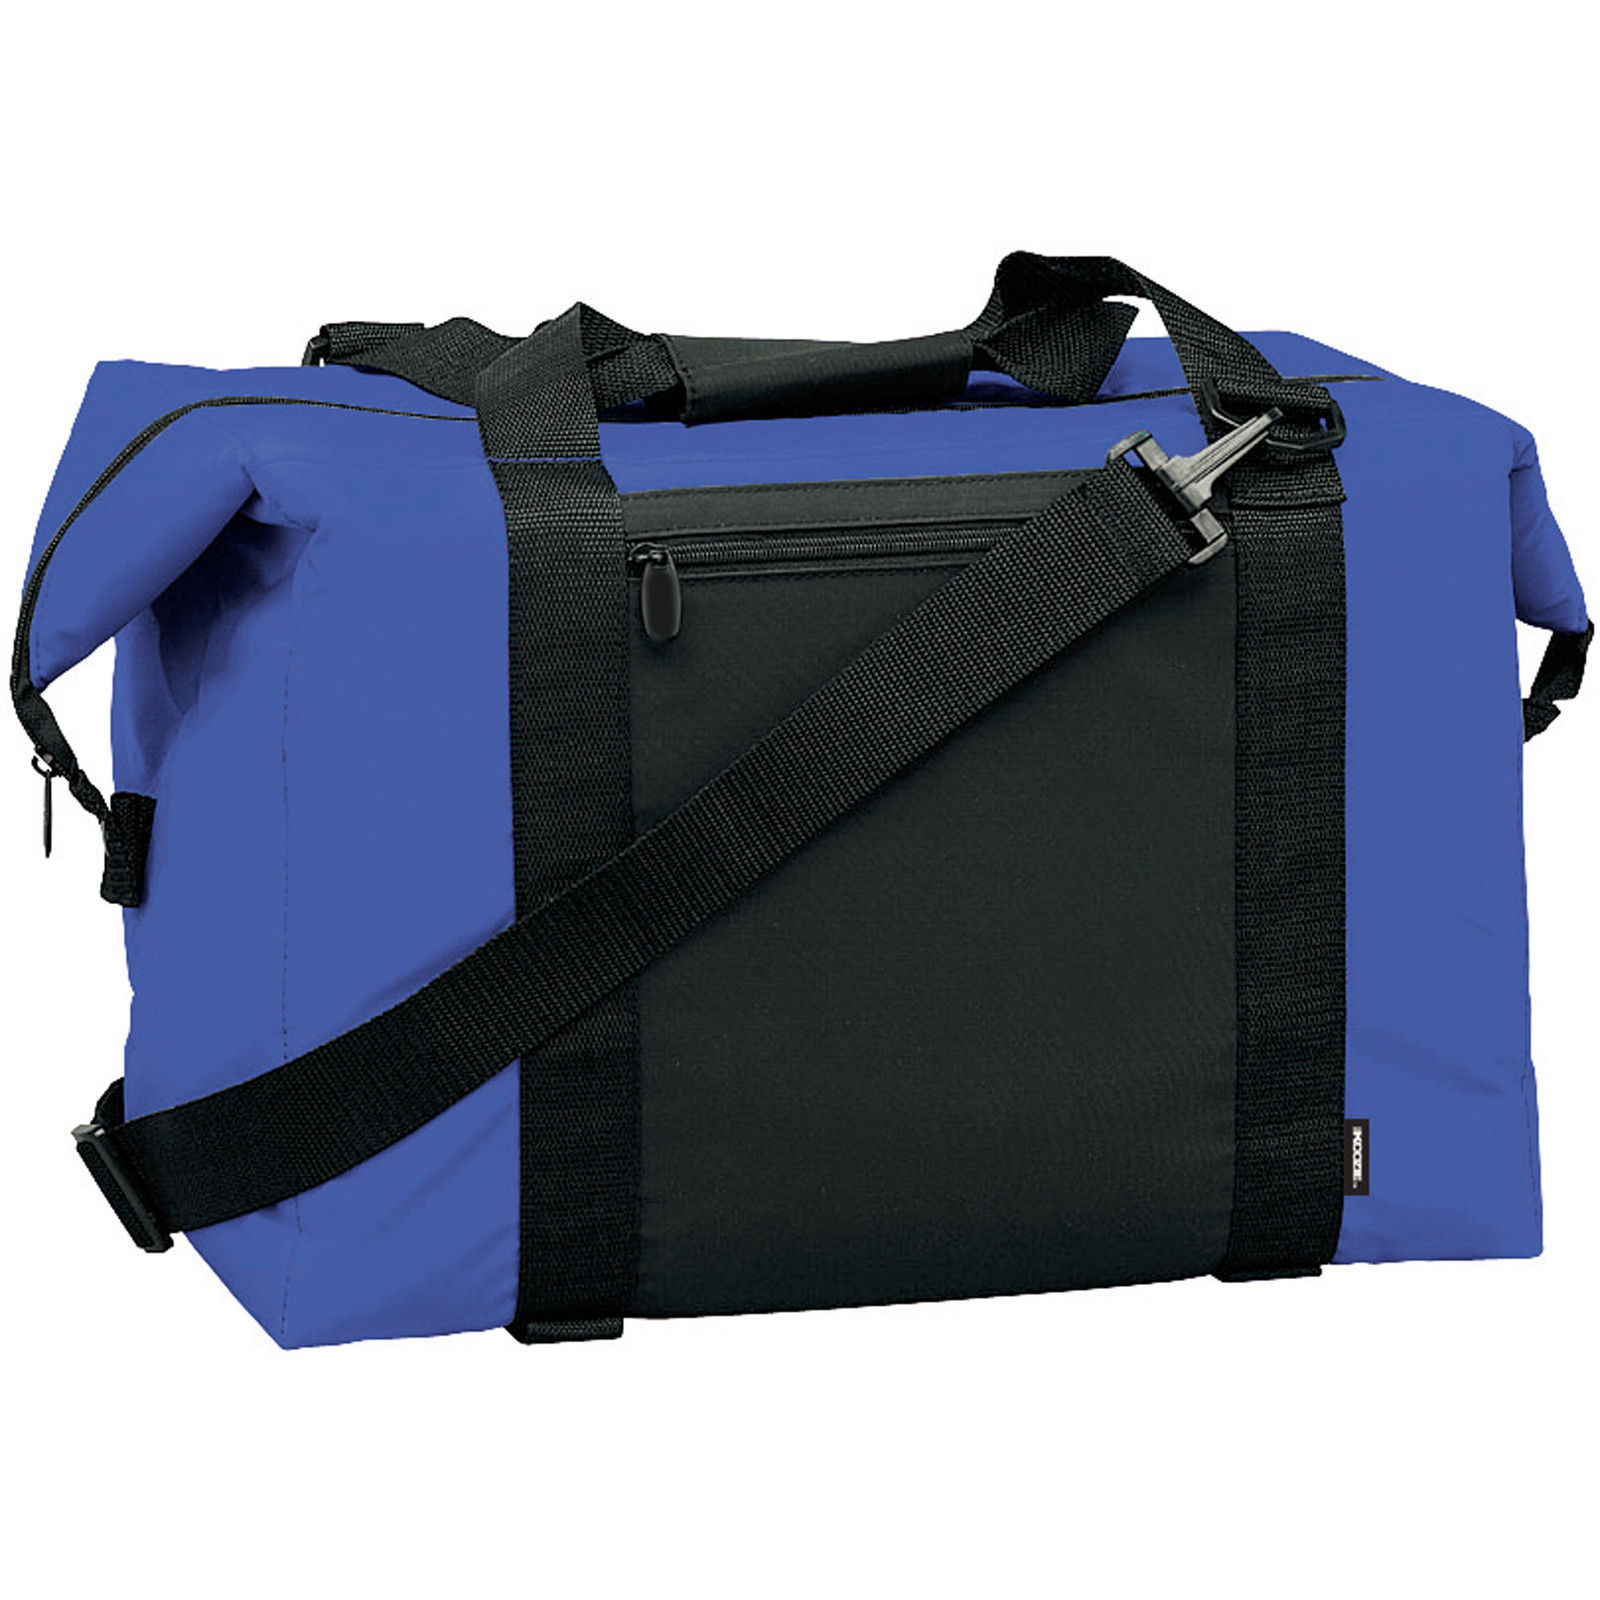 Koozie-Grand-Sac-Refrigerant-Cooler-Bag-XXL-Boite-dejeuner-canette